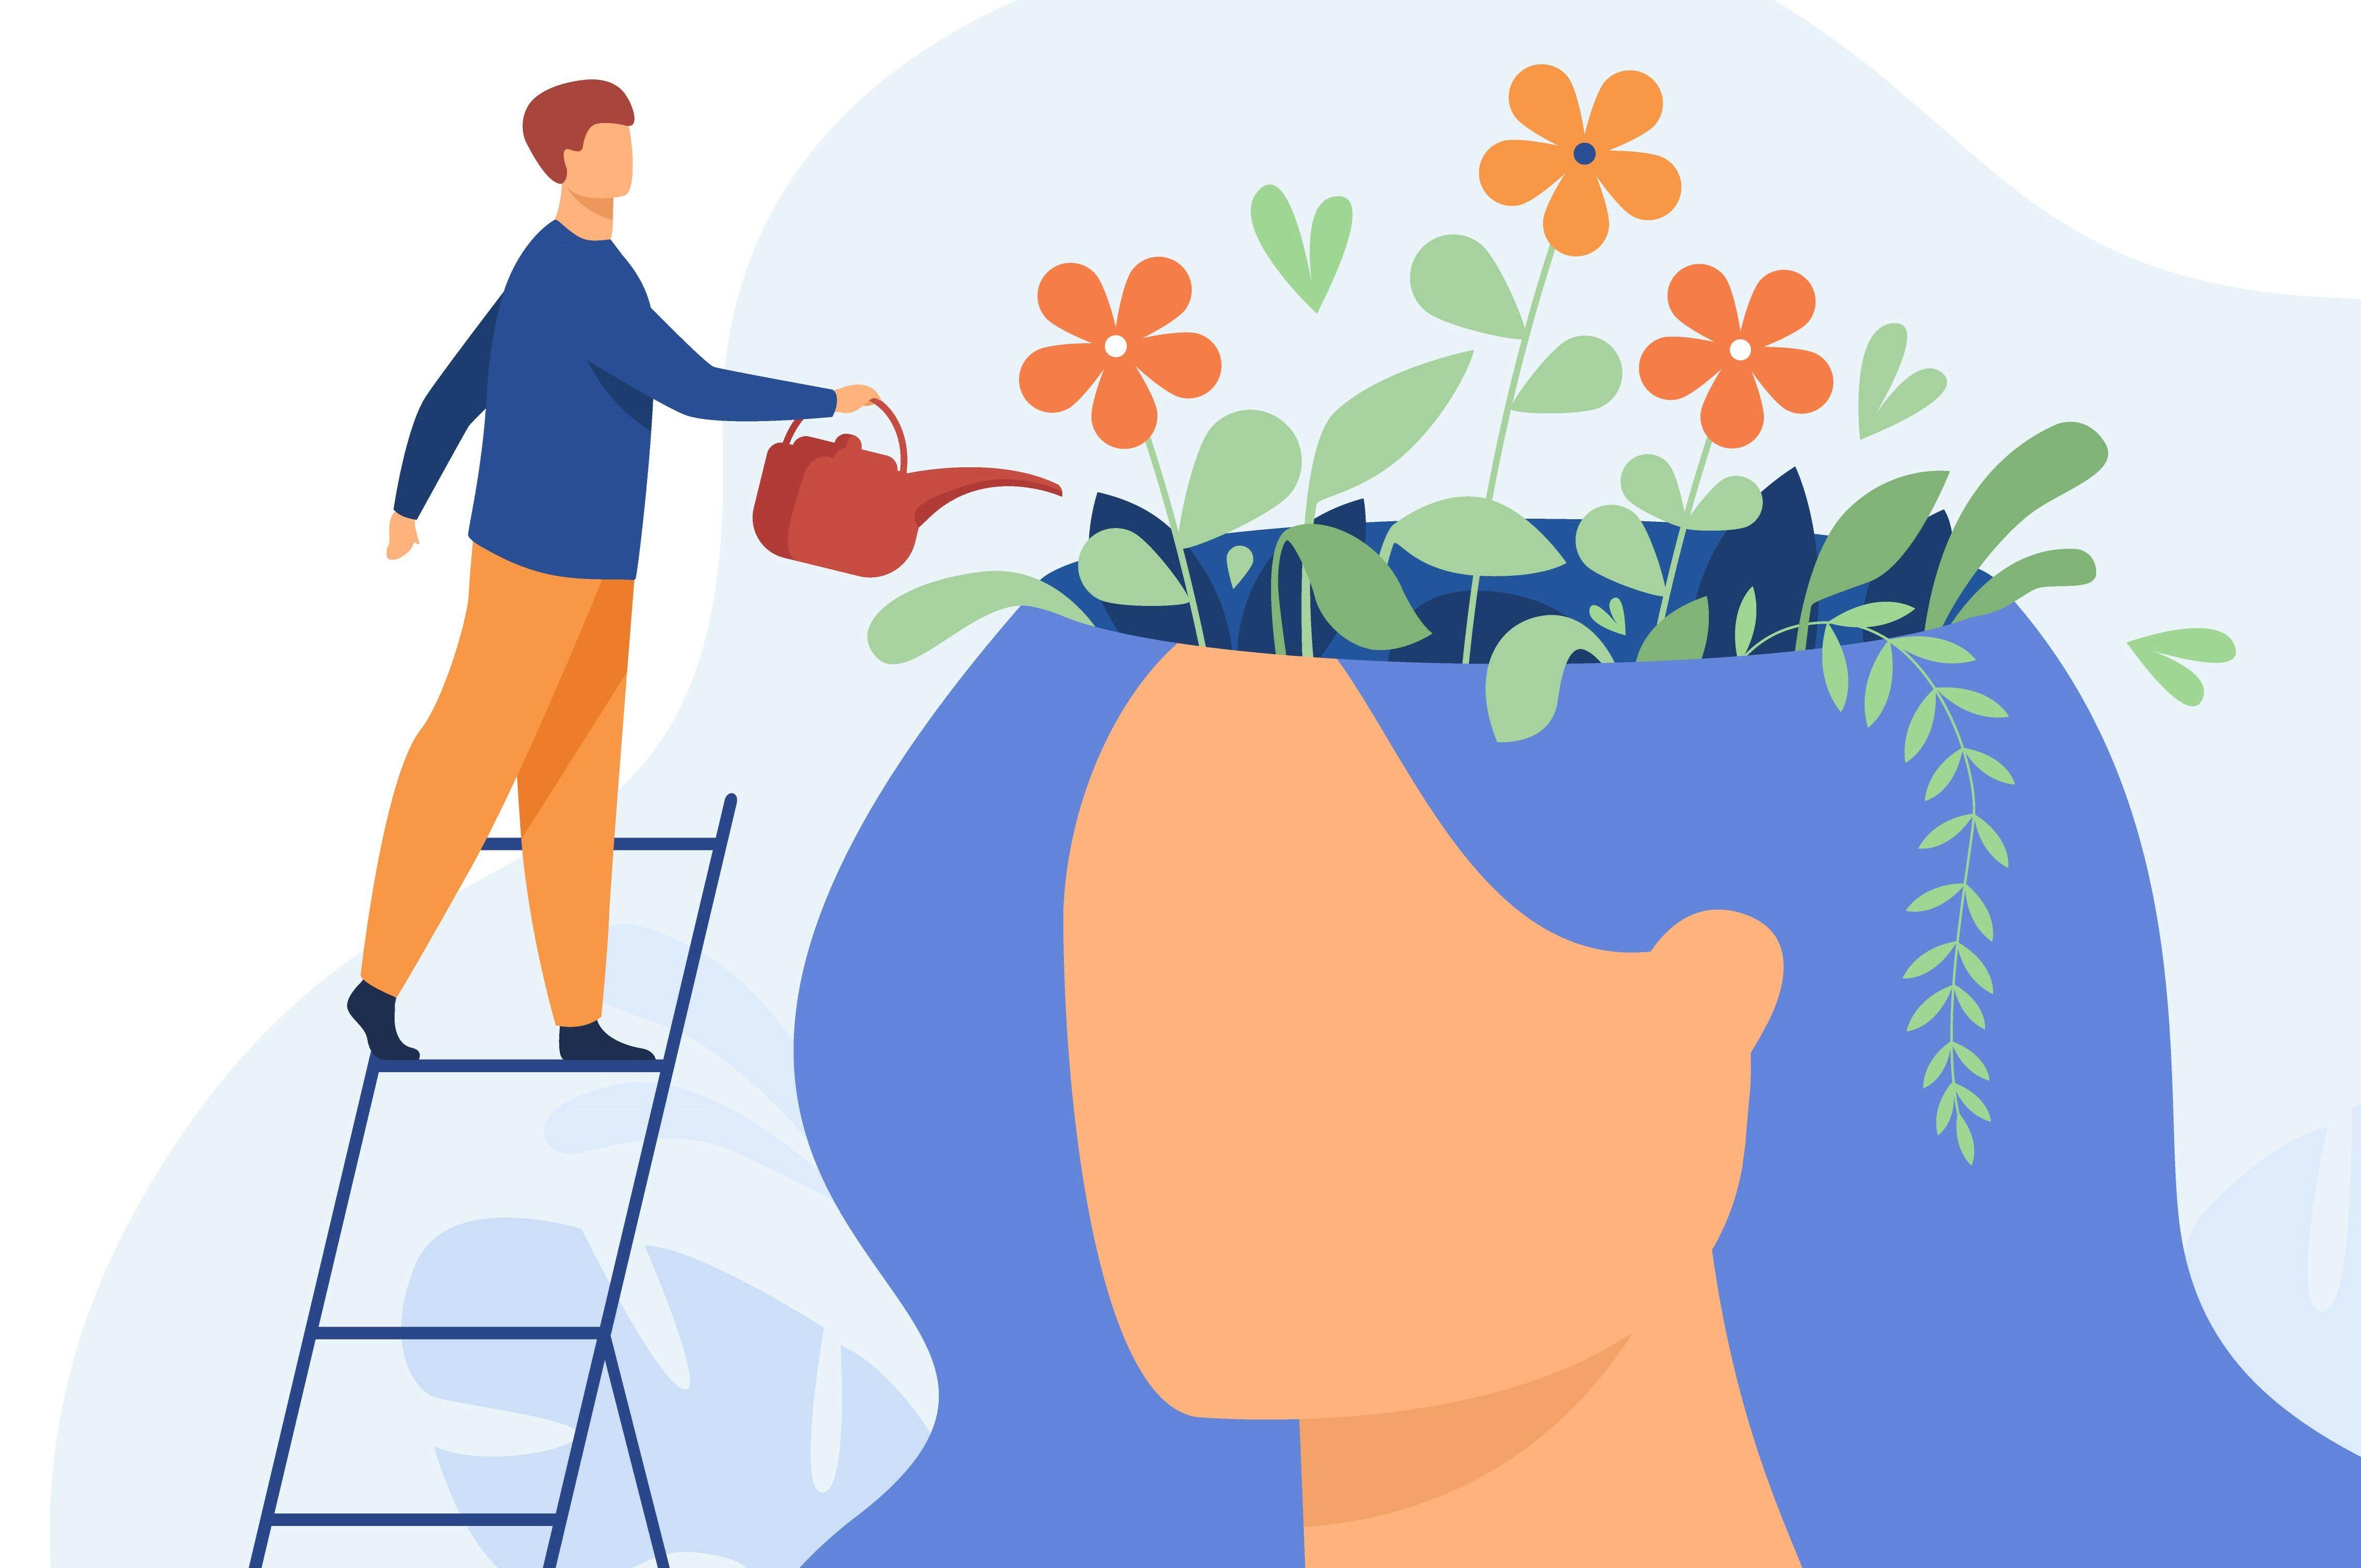 Nourishing the mind like a garden